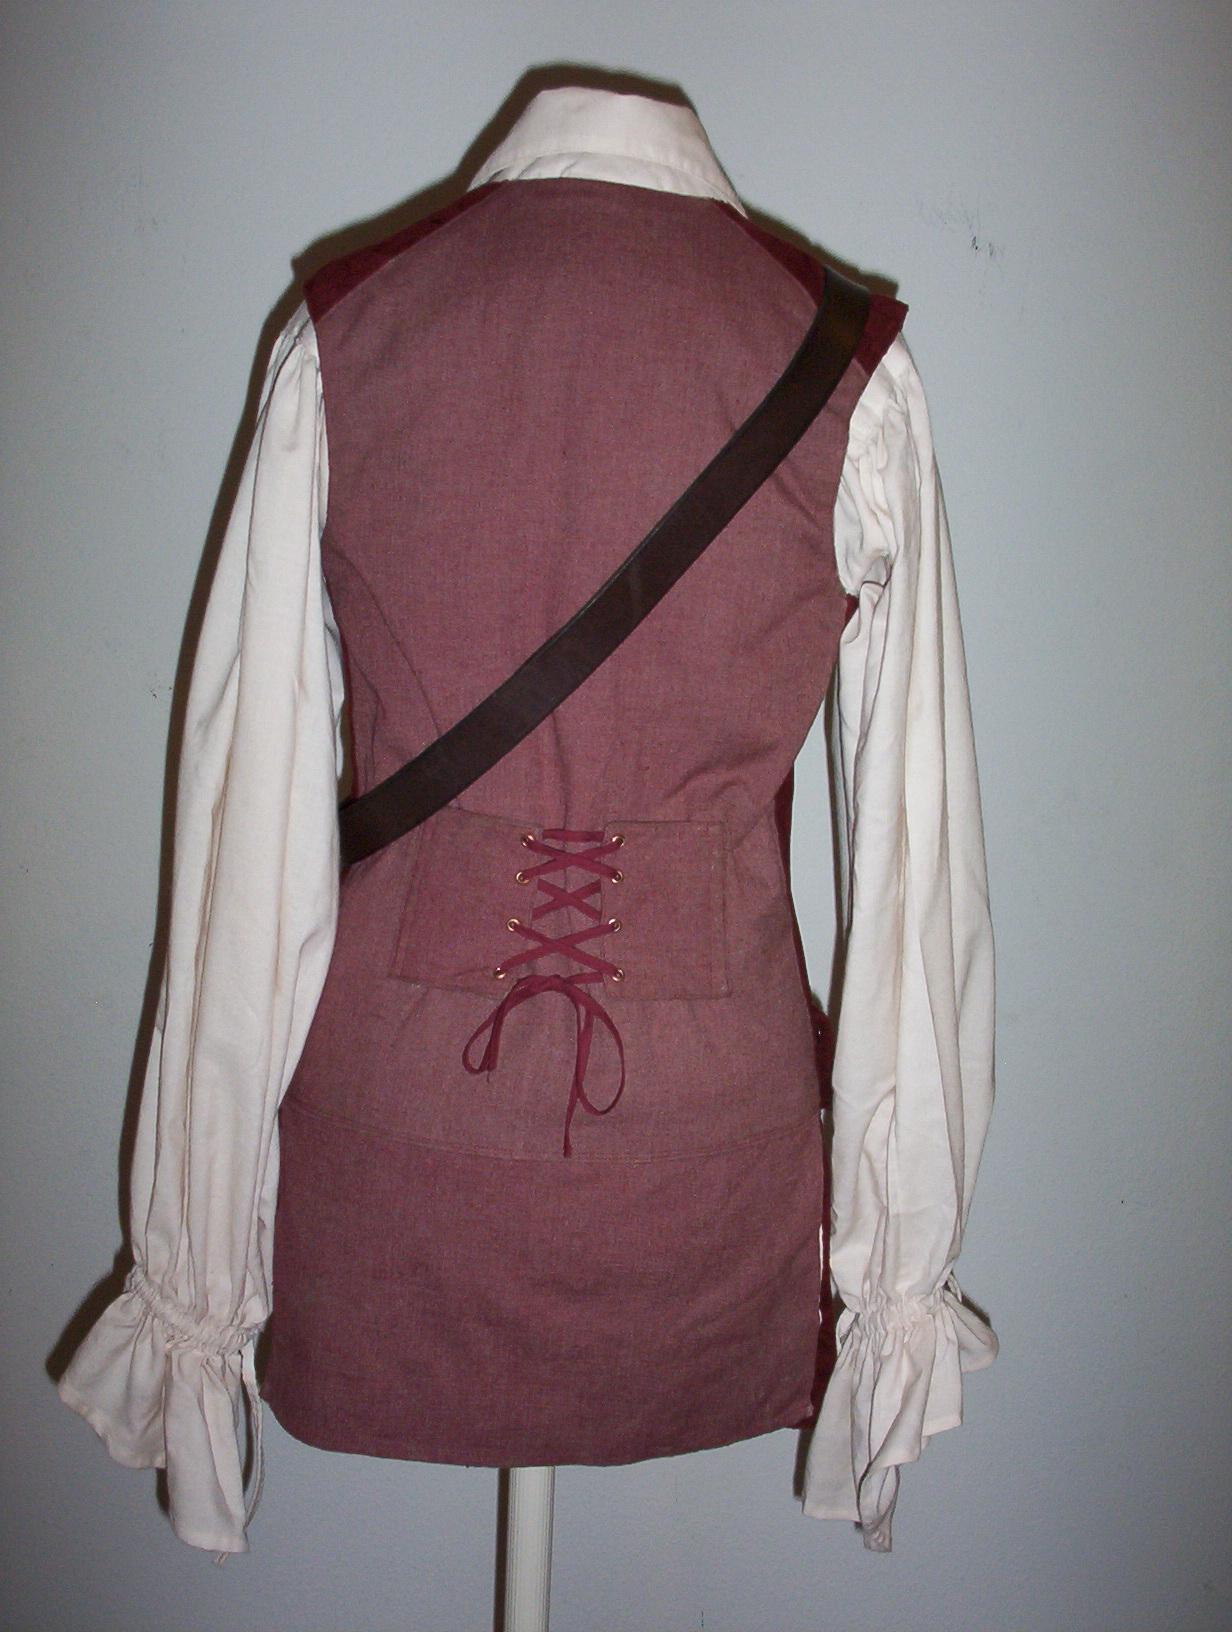 Pirate costume2 3009 (5).jpg